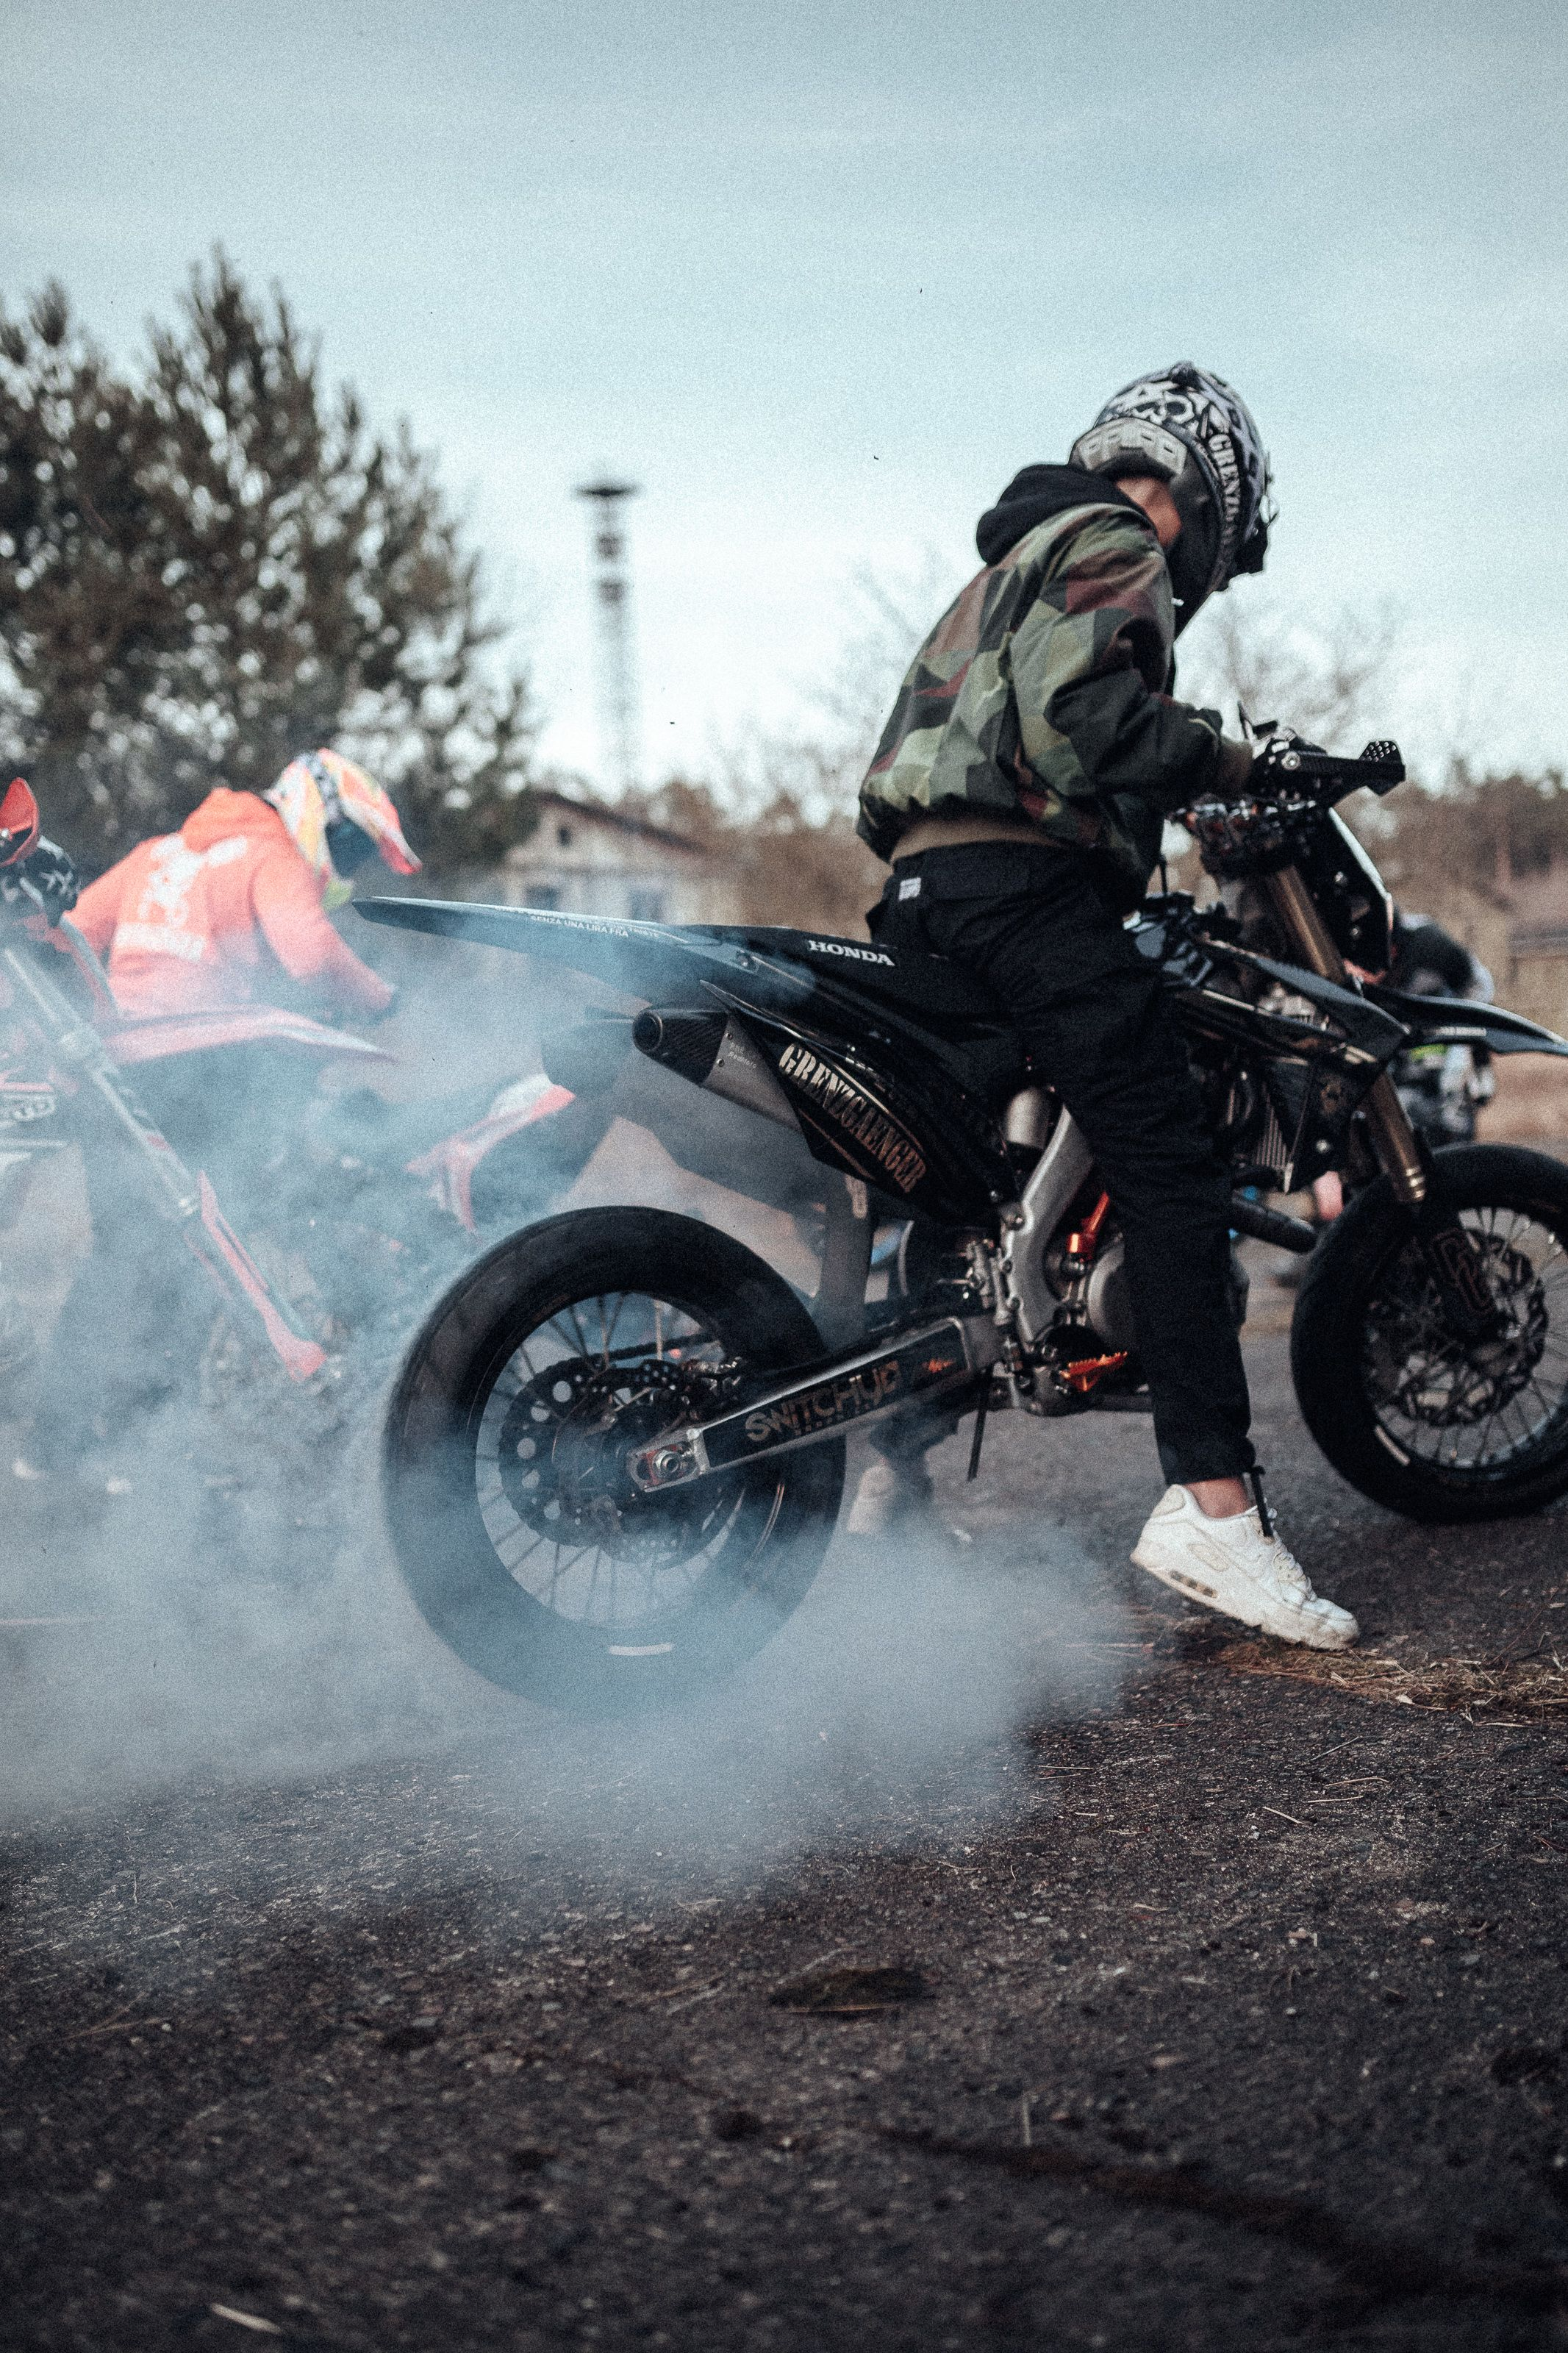 Grenzgaenger Burnout Wheelies Ride Supermoto Enduro Stunt